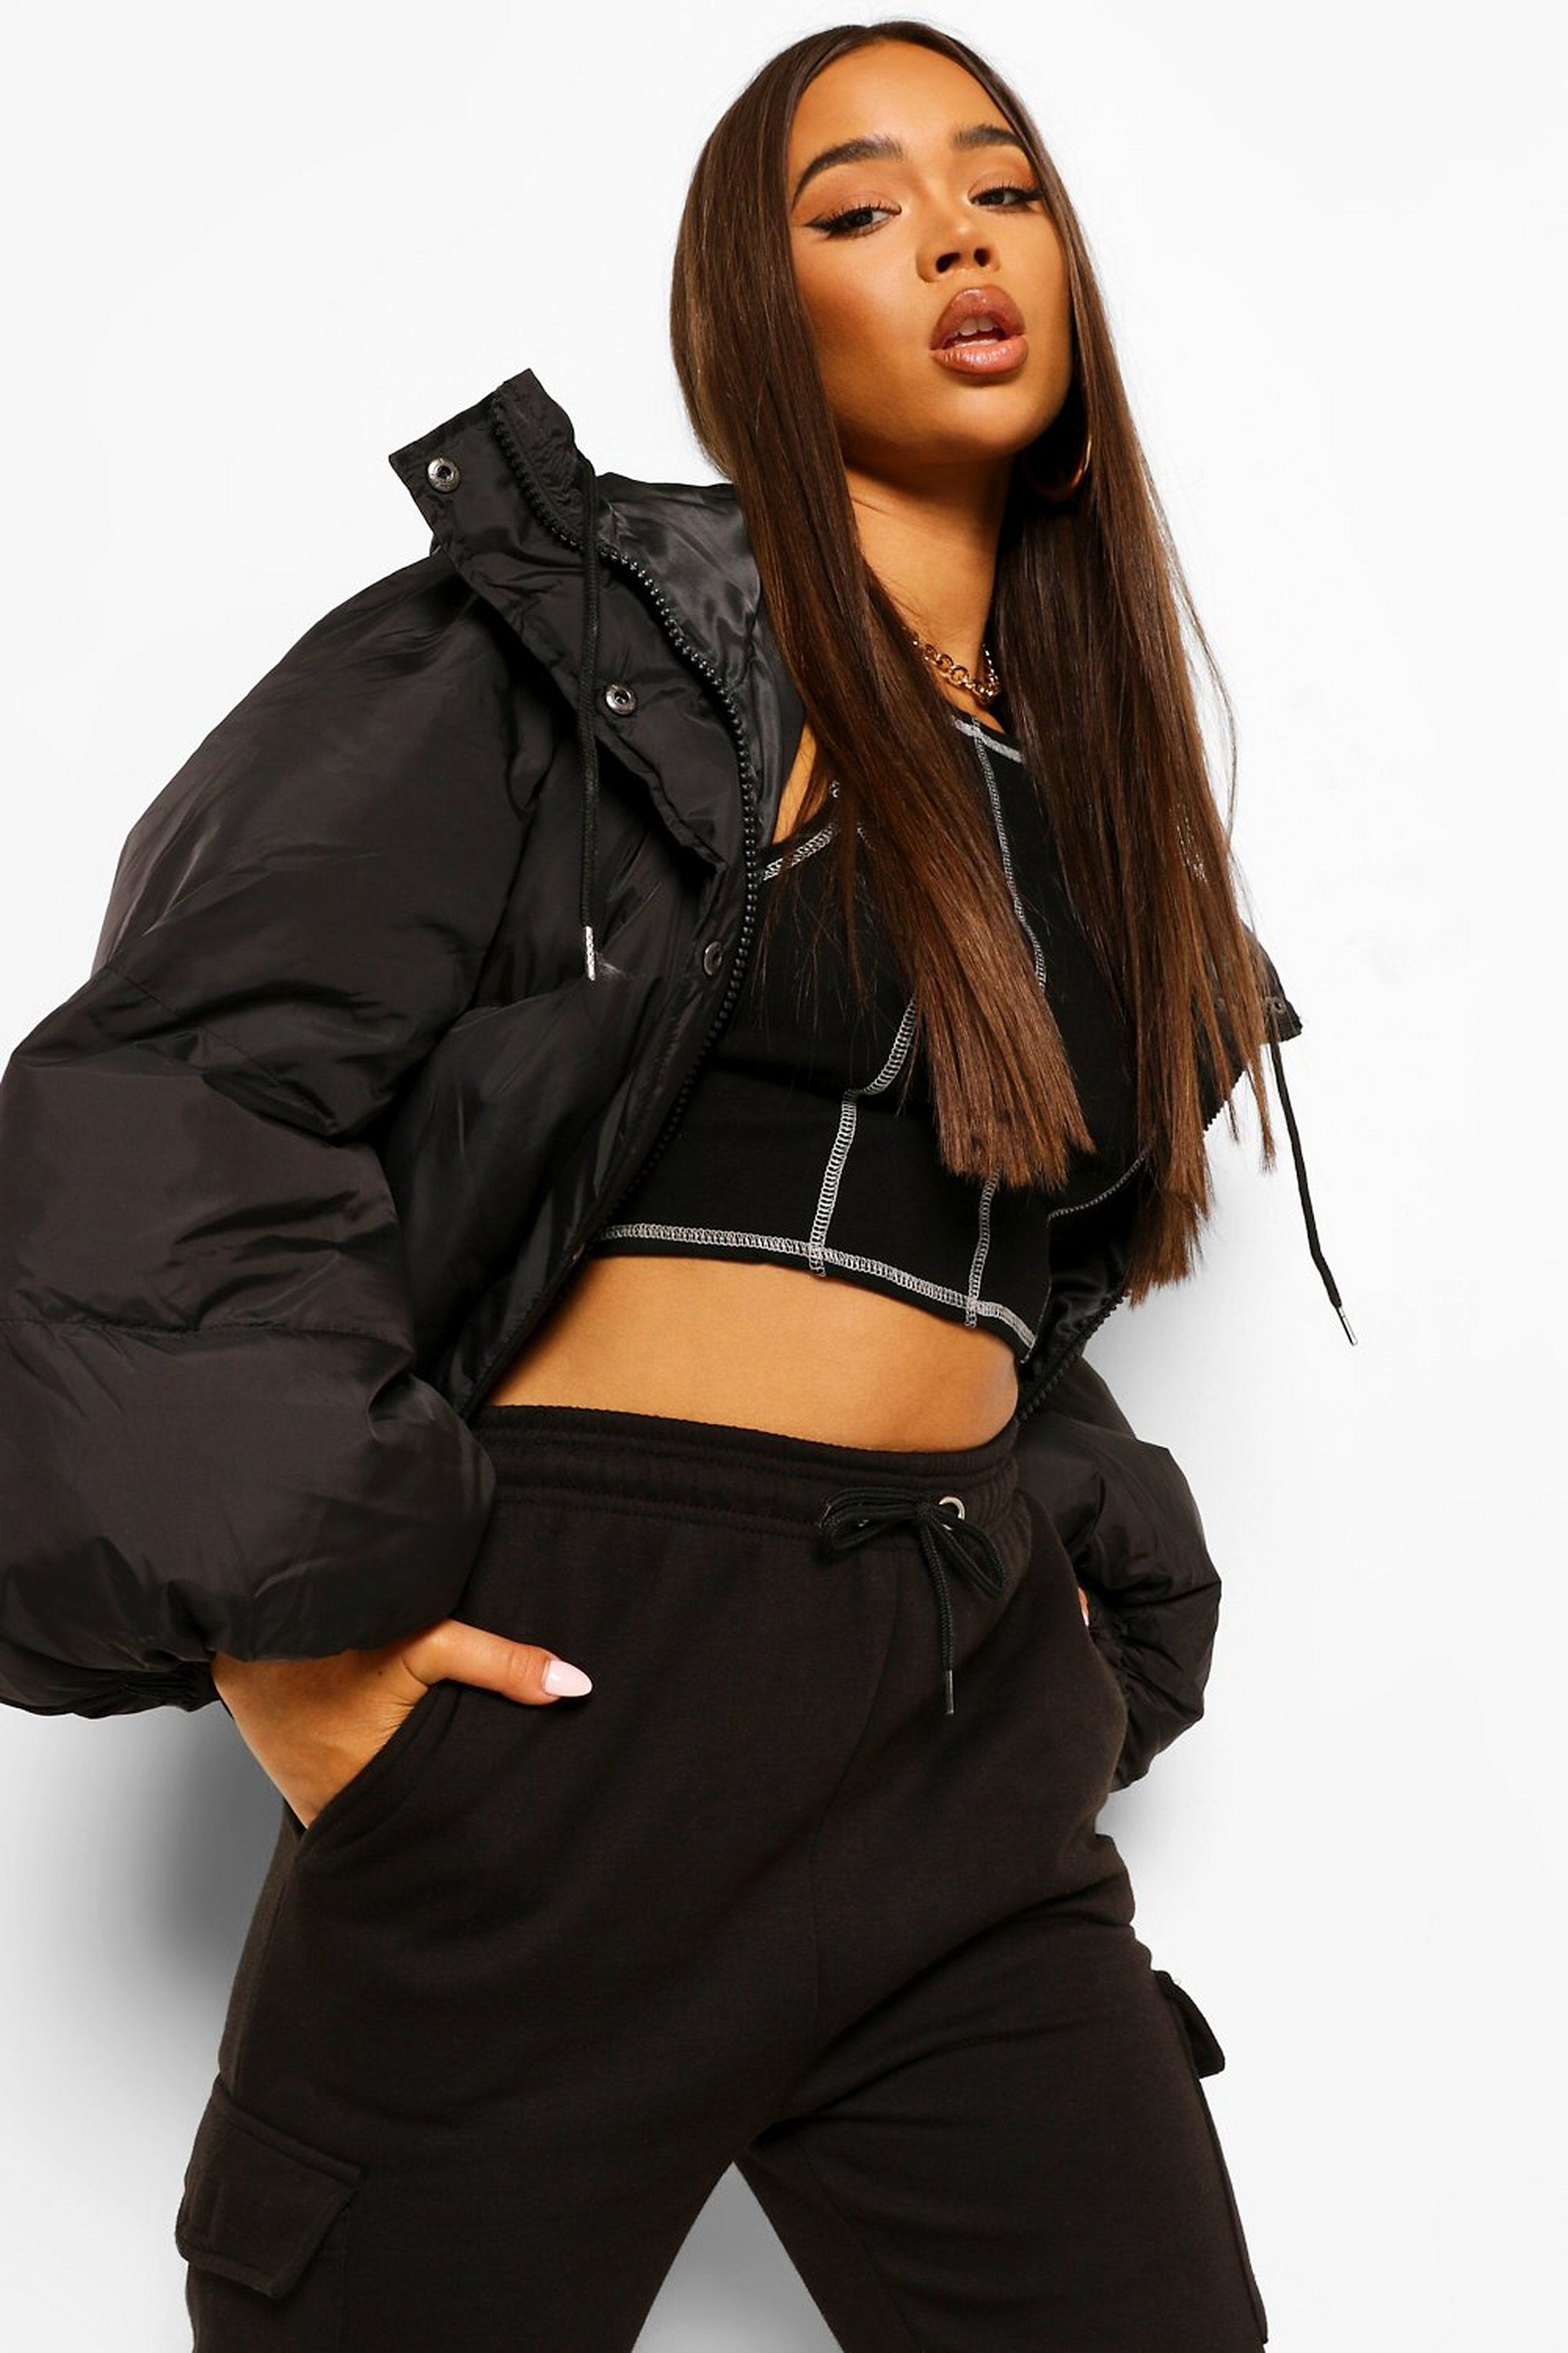 Oversized Sleeve Hooded Puffer Jacket Boohoo Oversize Sleeves Jackets Coats Jackets Women [ 3272 x 2181 Pixel ]